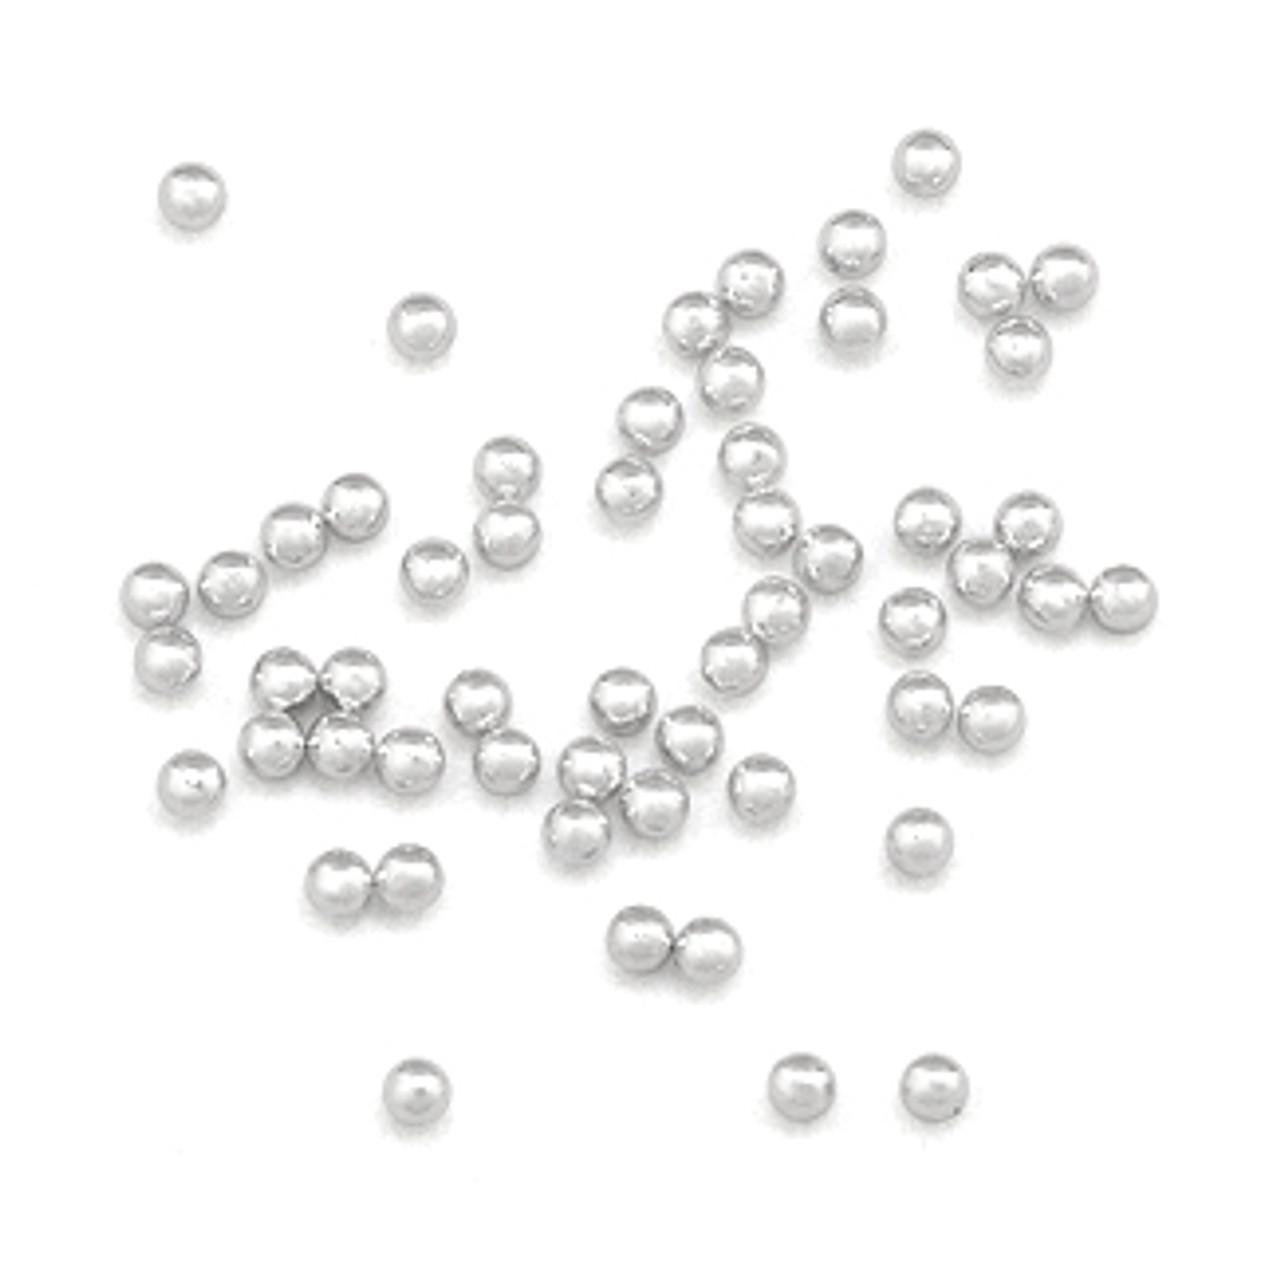 1.5mm Solid Ball (75 pcs.)